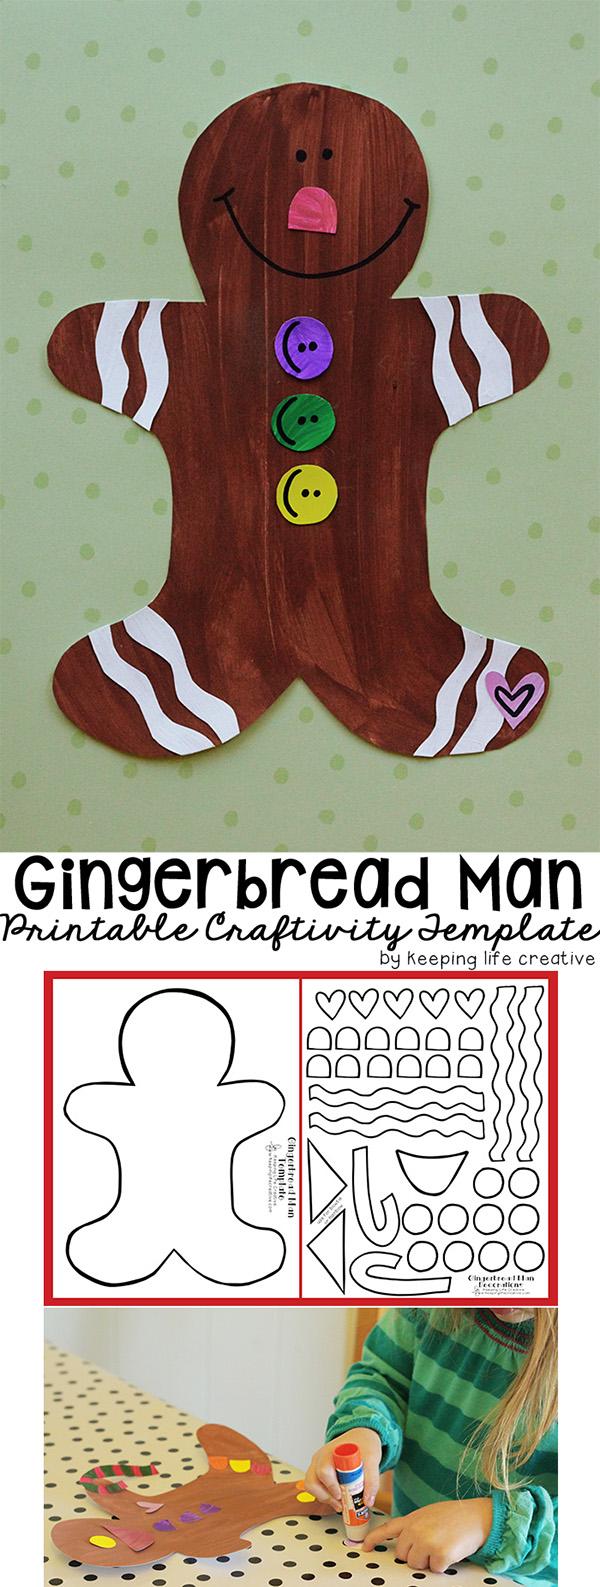 Gingerbread Man Craftivity makes a fun Christmas craft!